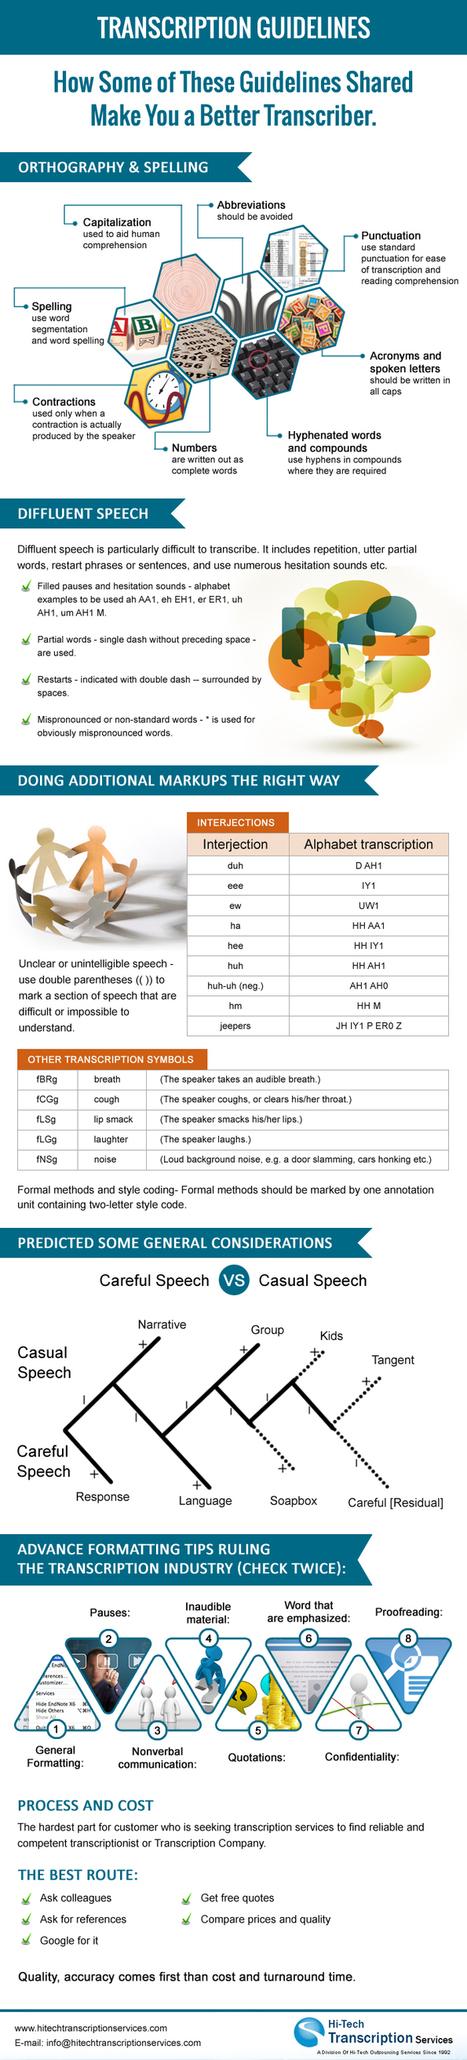 How to Get Effective Audio & Video Transcripts? - Hi-Tech Transcription Services | Transcribers-India | Scoop.it